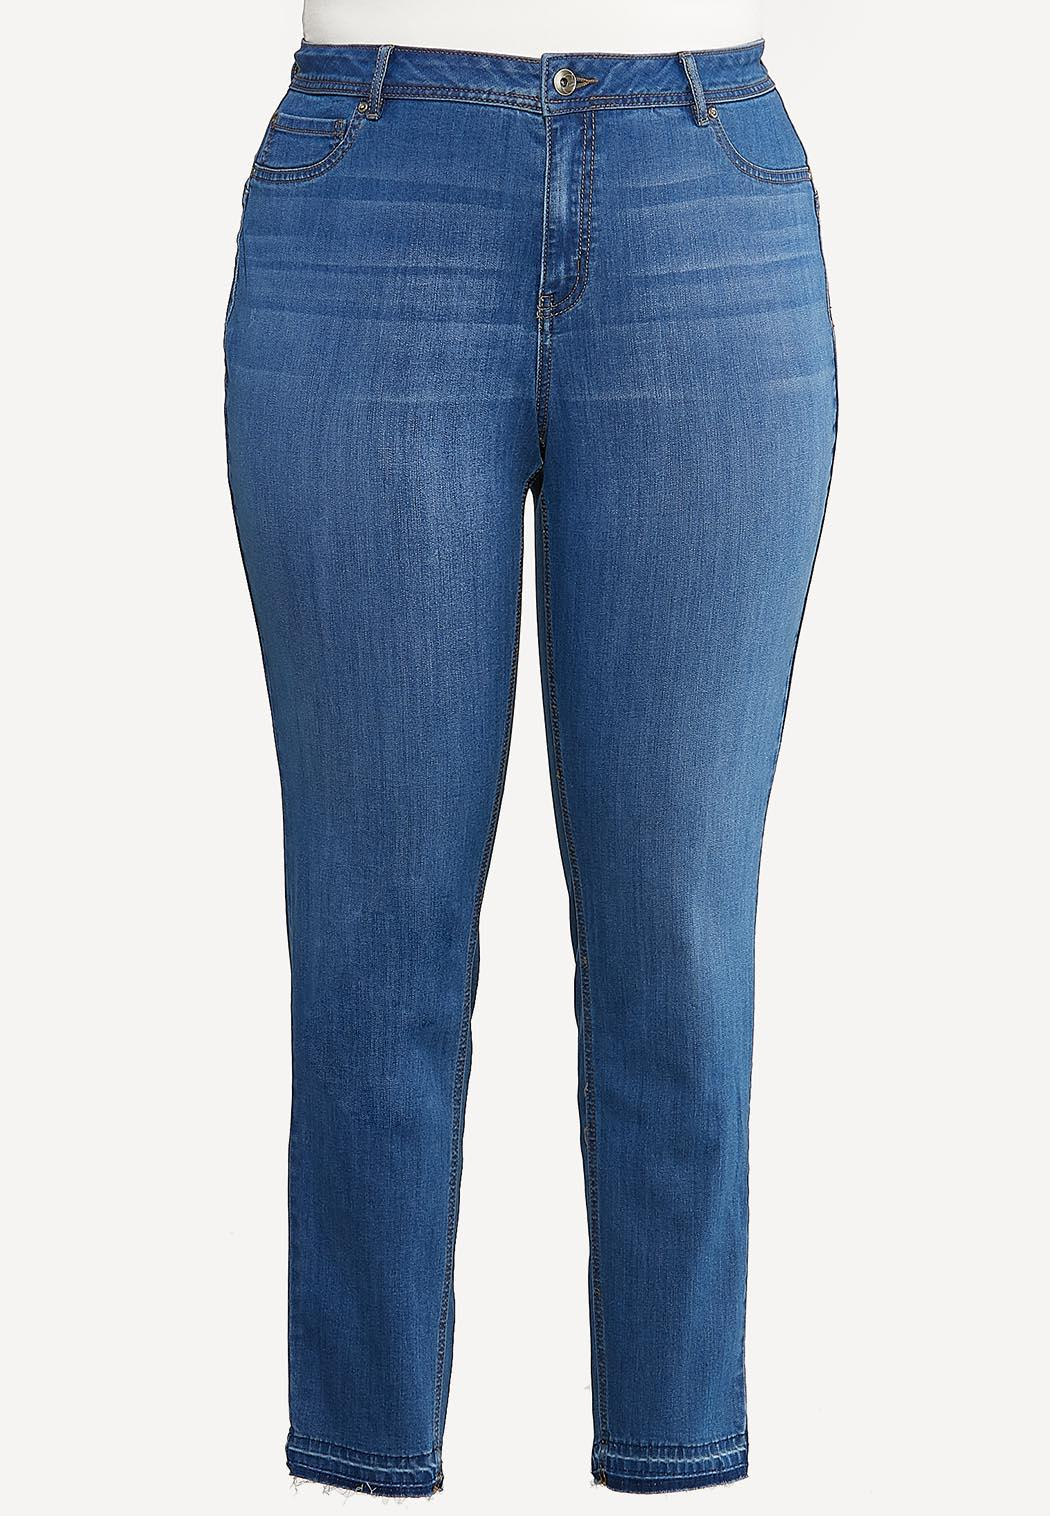 Plus Size Fray Hem Uplifting Jeans